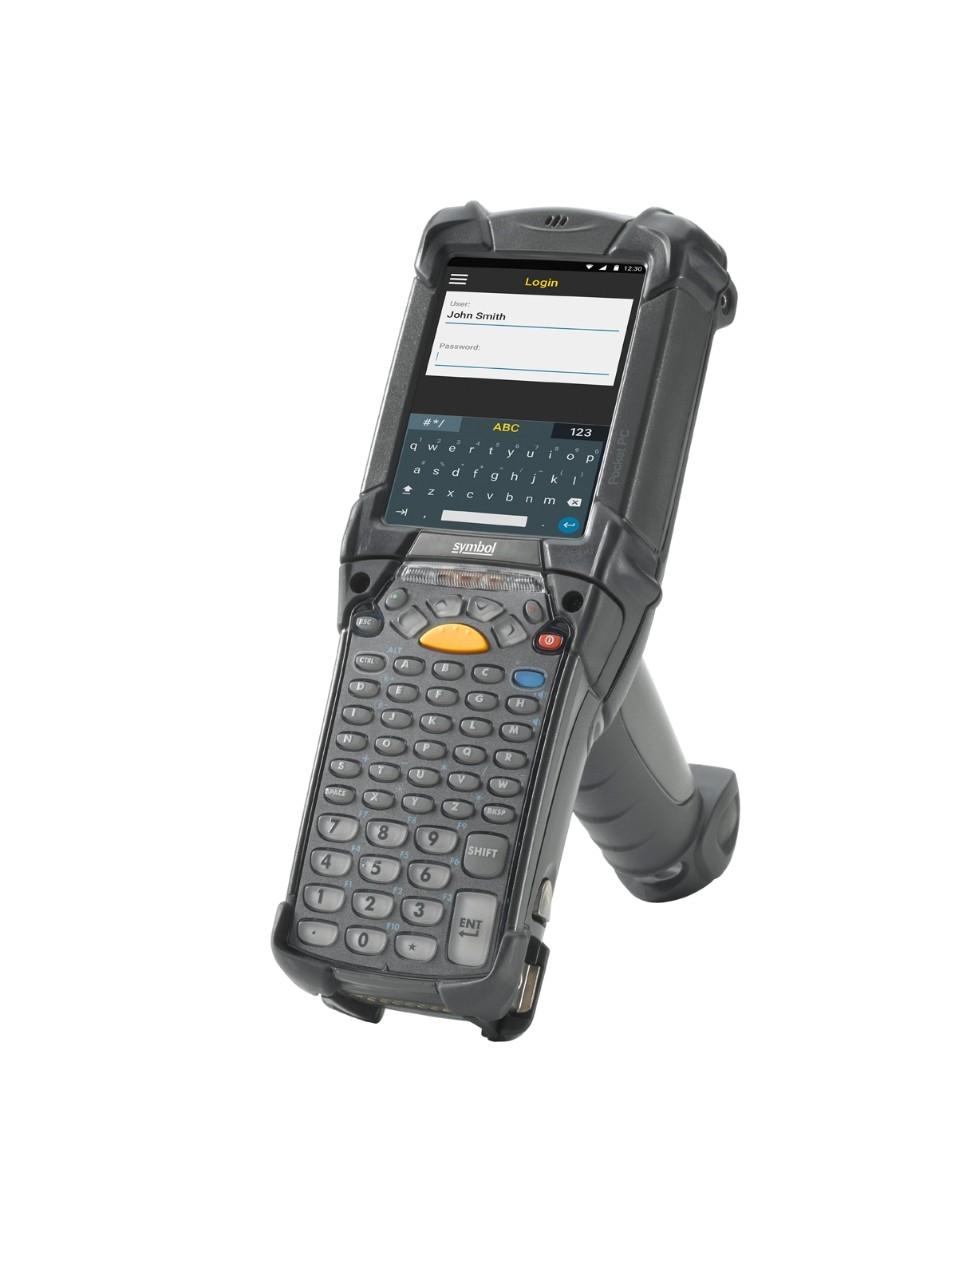 Vista lateral izquierda de la computadora móvilMC9200 Android de Zebra